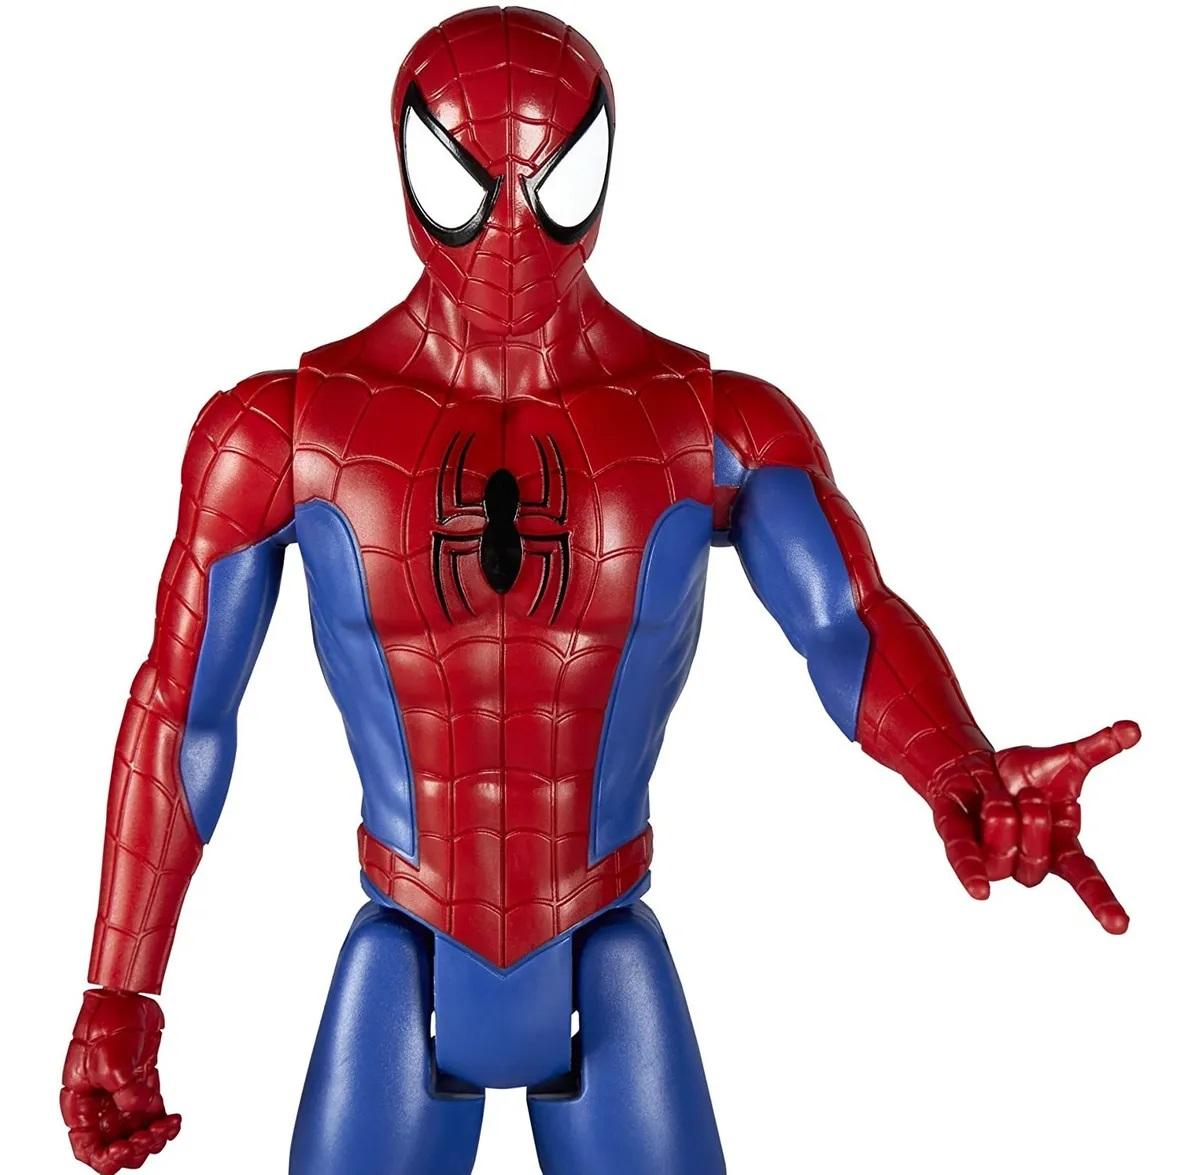 Boneco Homem Aranha Titan Hero Series Marvel  Hasbro E7333